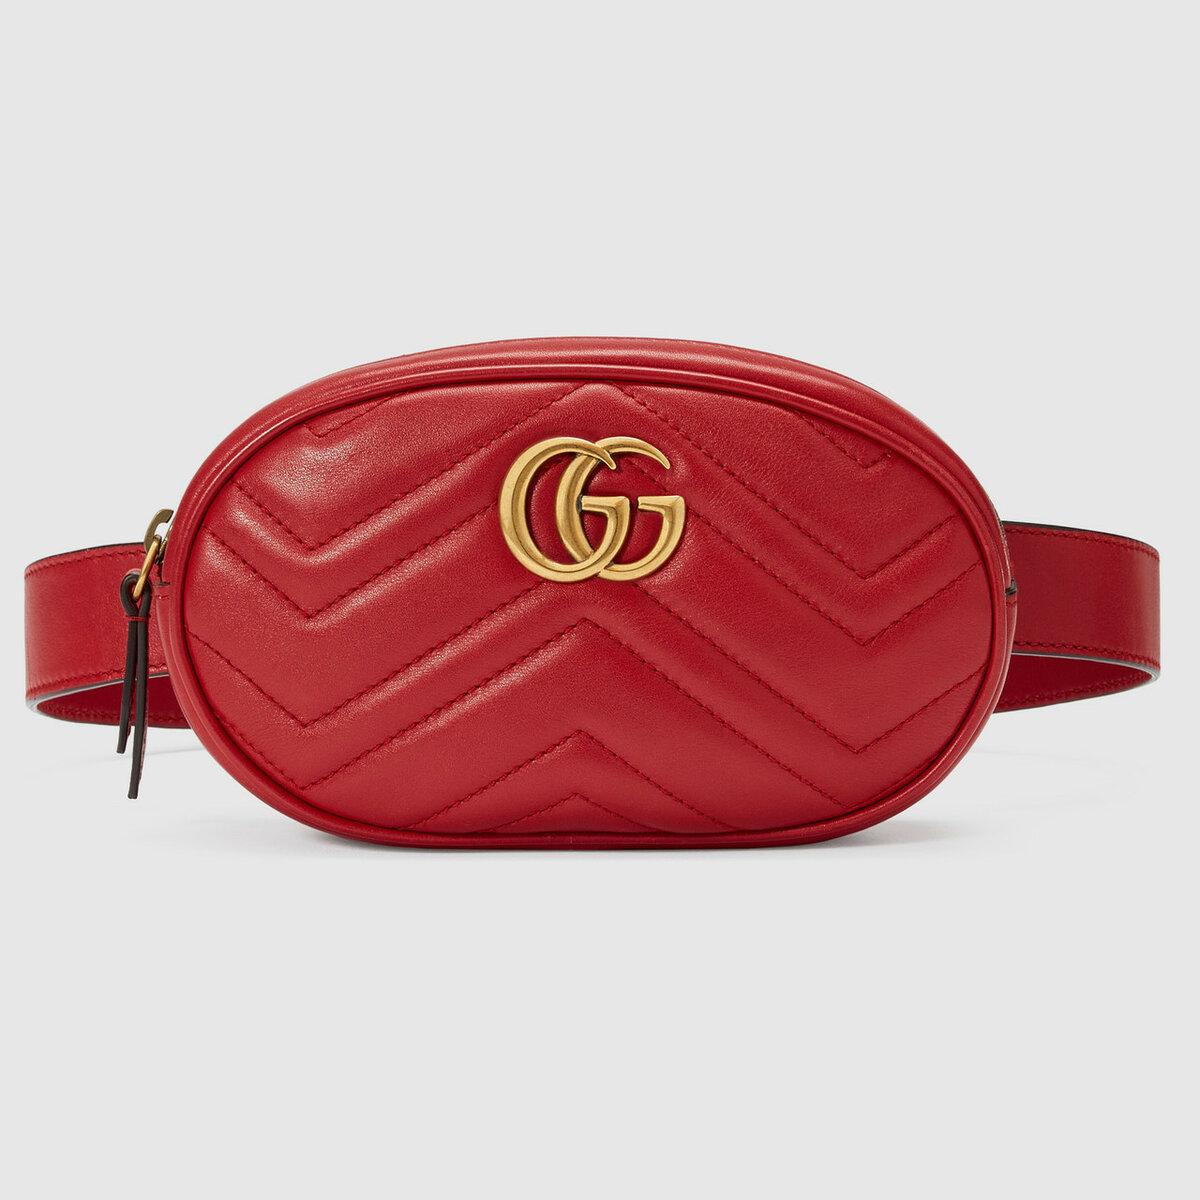 Поясная сумочка GG Marmont в Енакиево